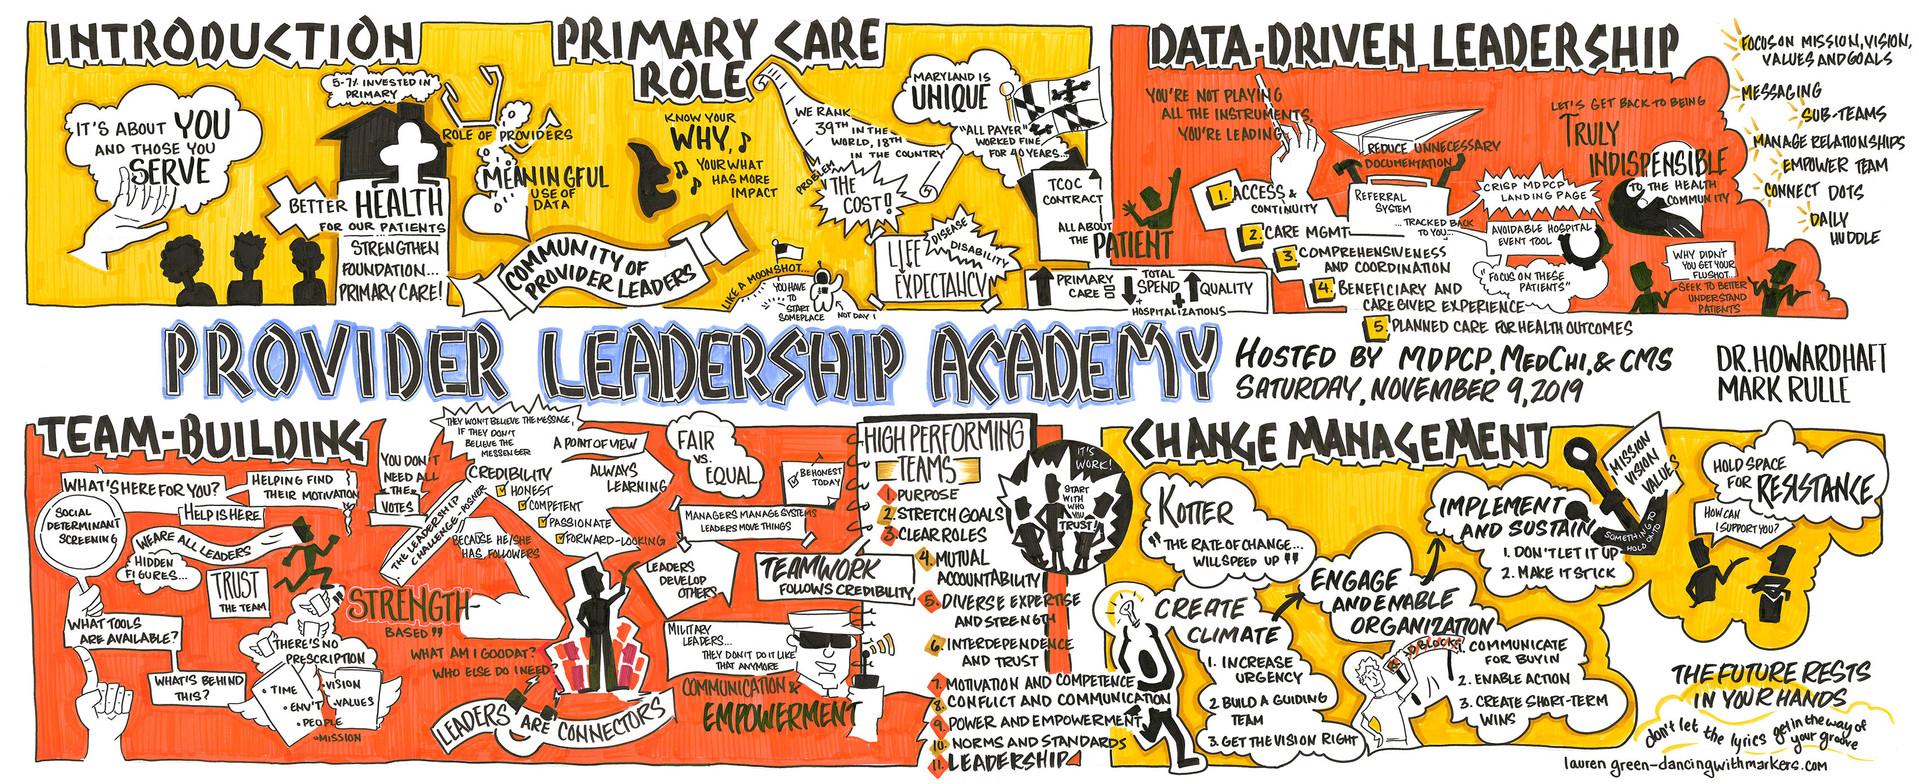 Provider Leadership Academy